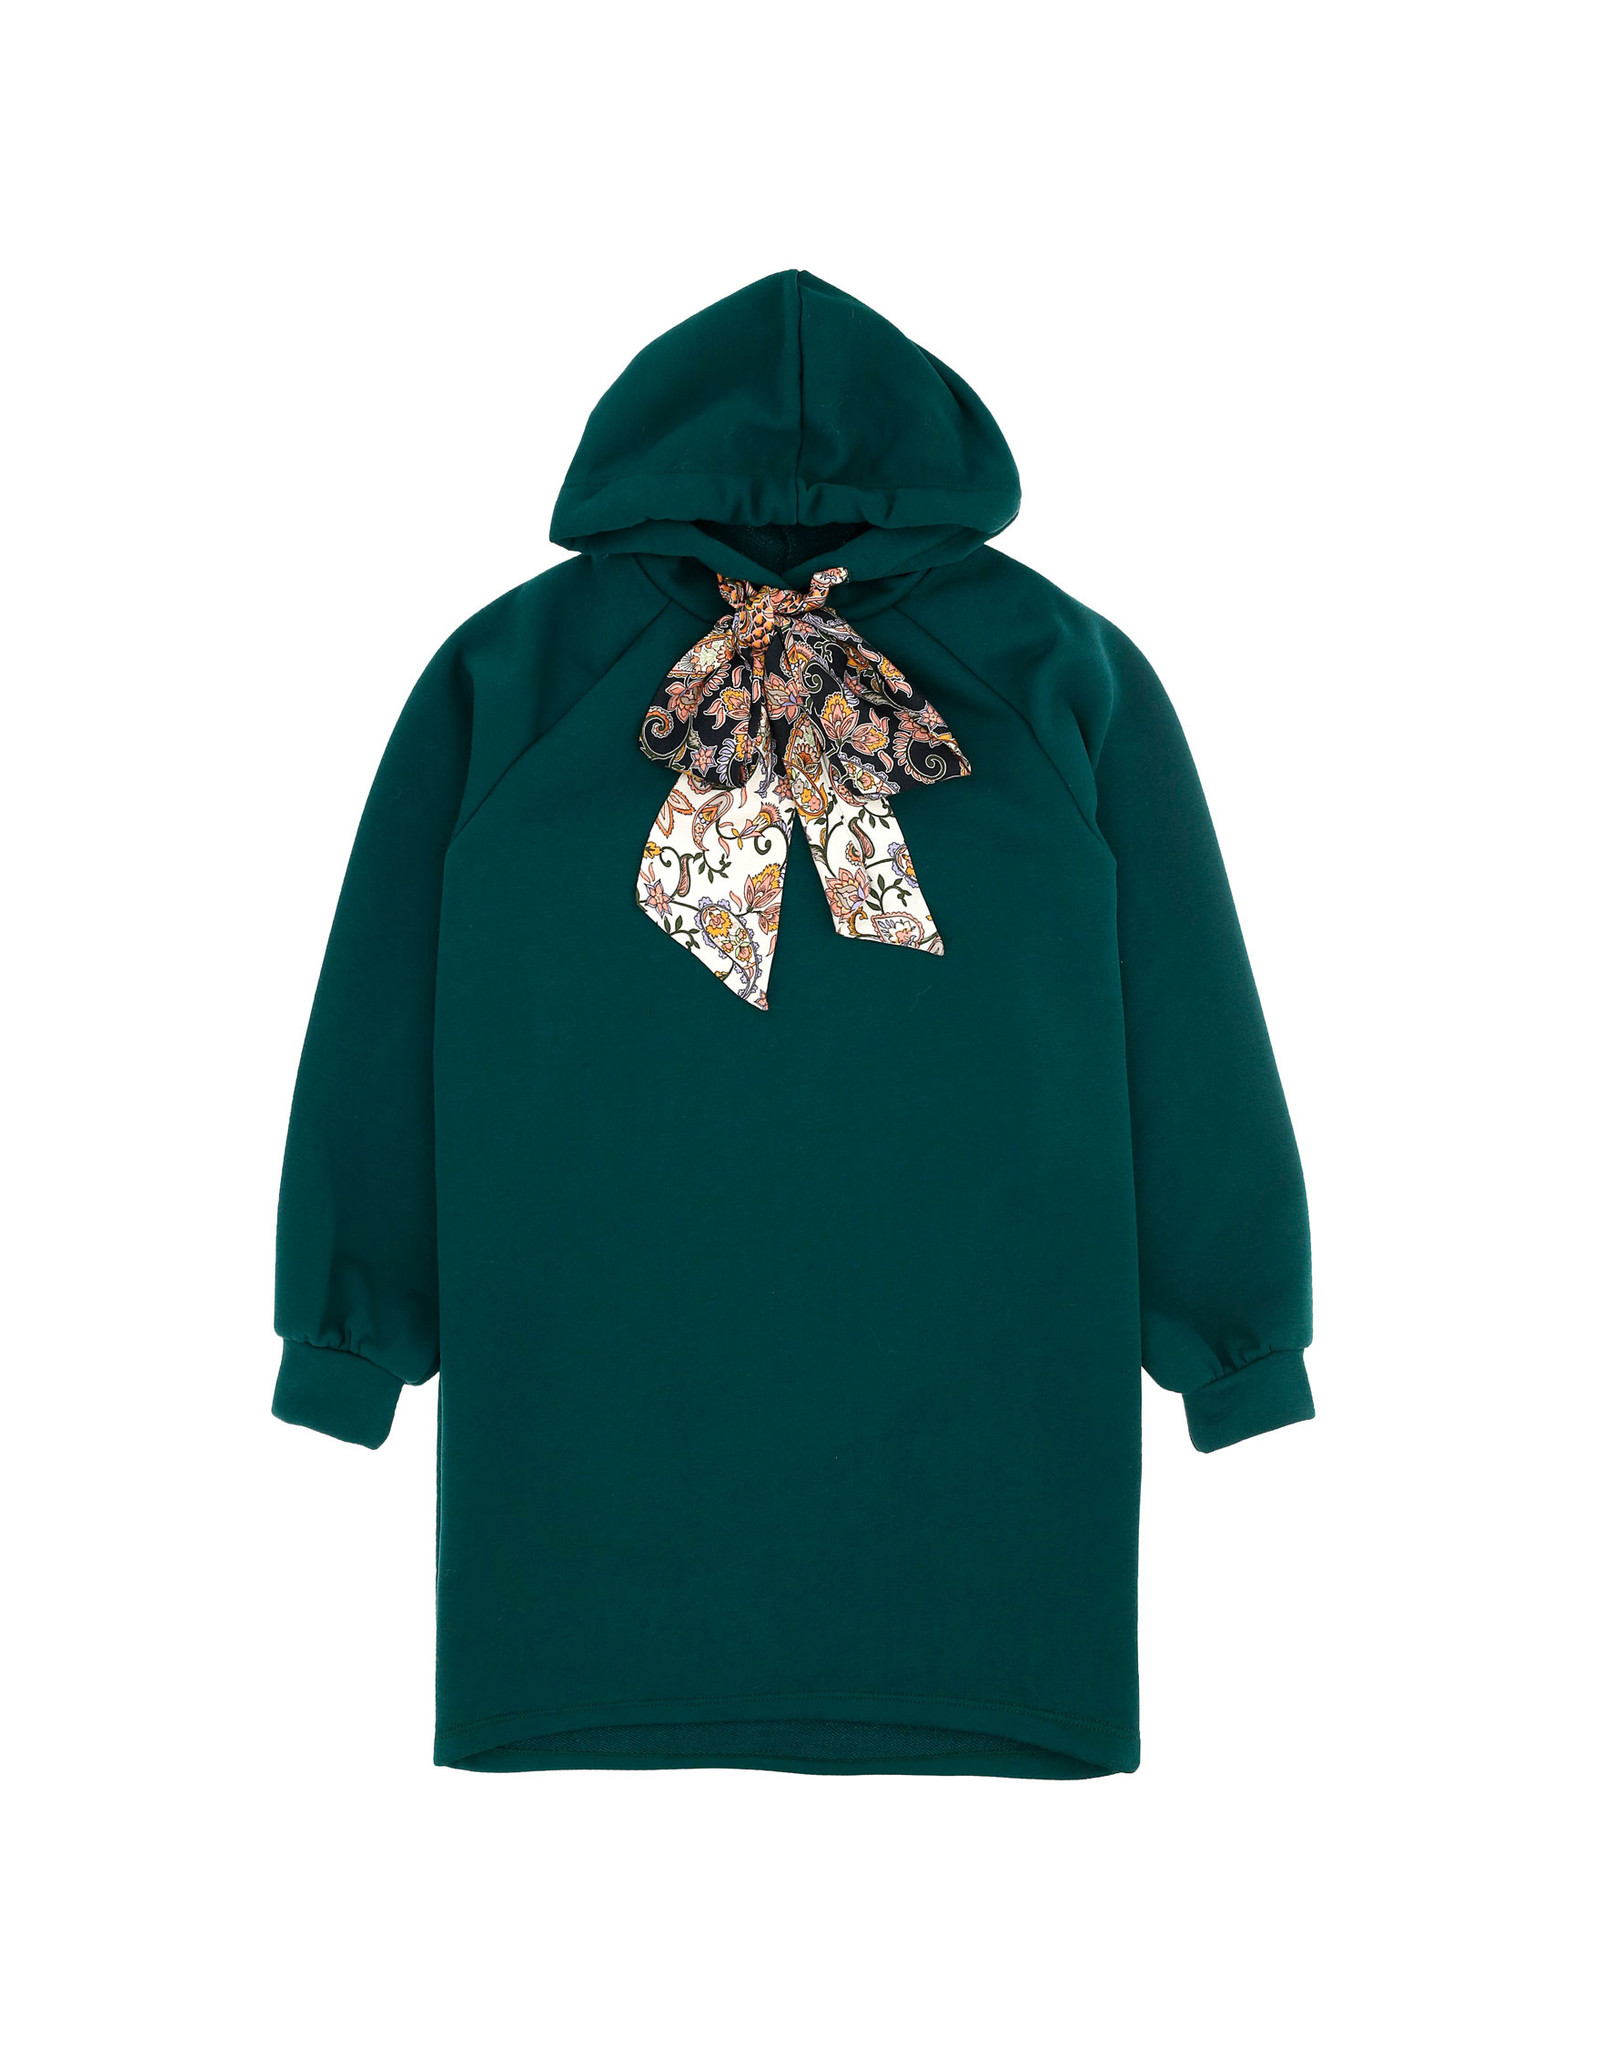 Dixie Sweaterkleed donkergroen strik